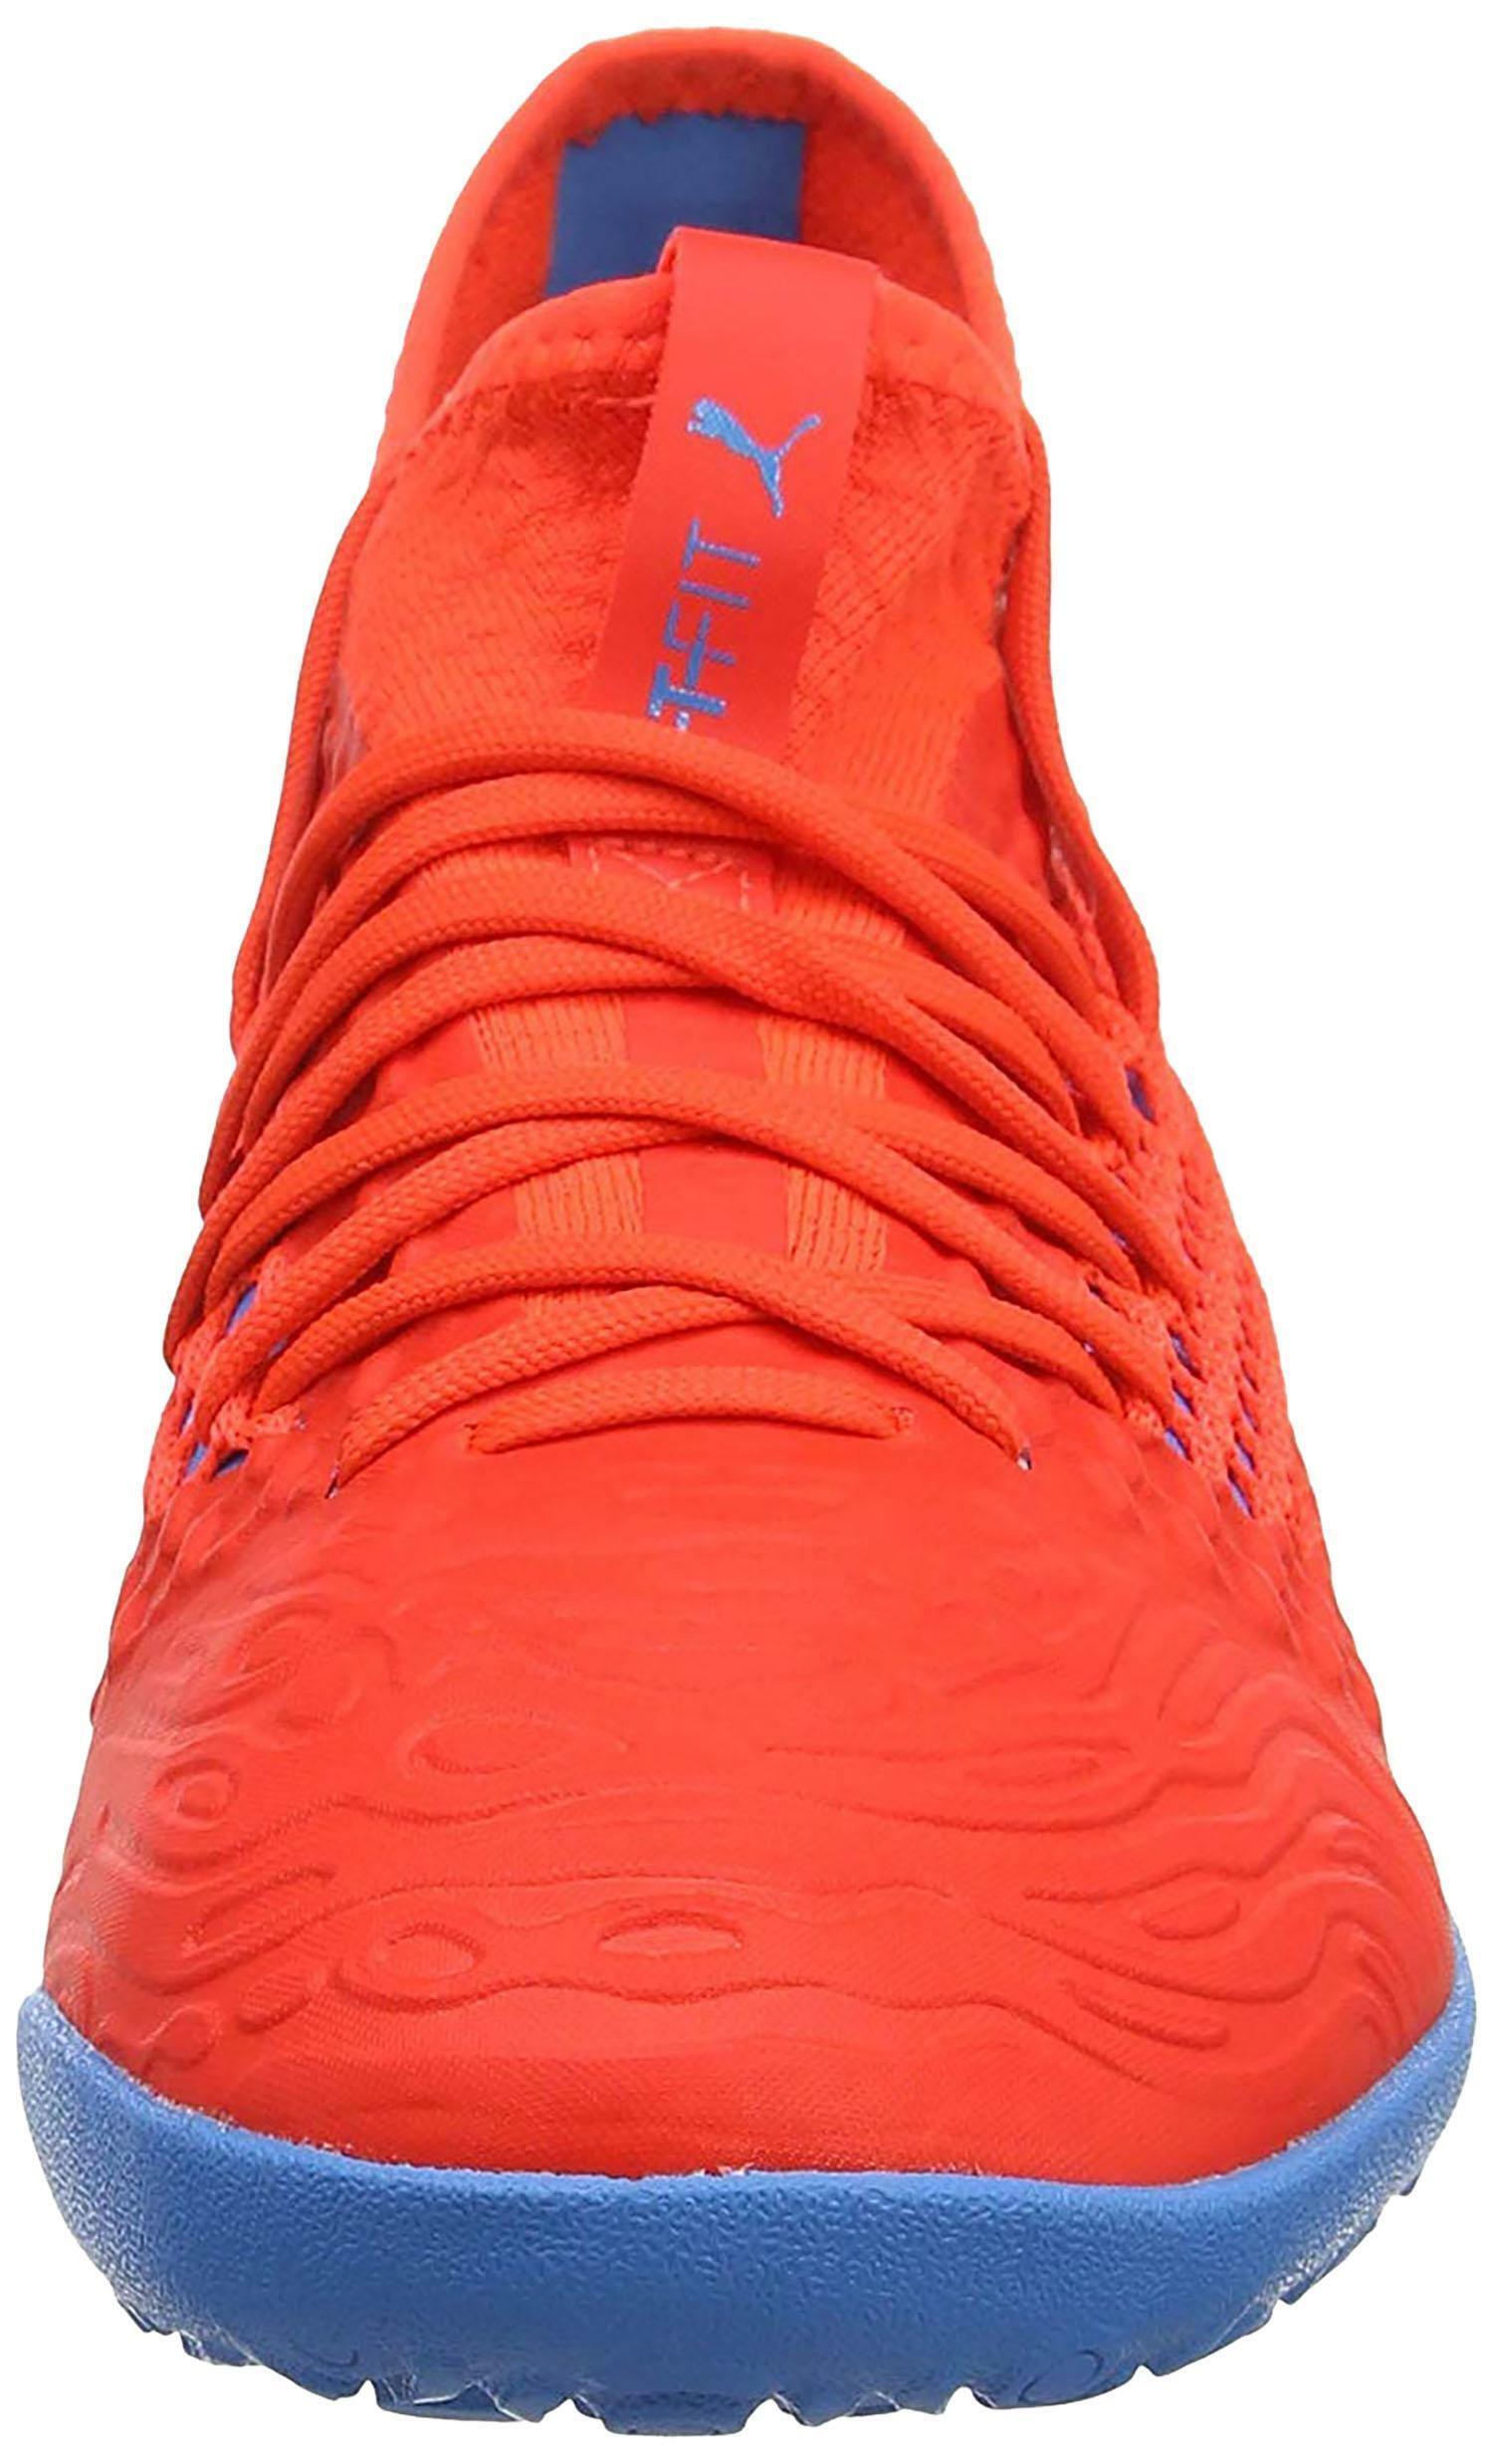 Puma future 19.3 netfit tt scarpe calcetto uomo rosse 10554201